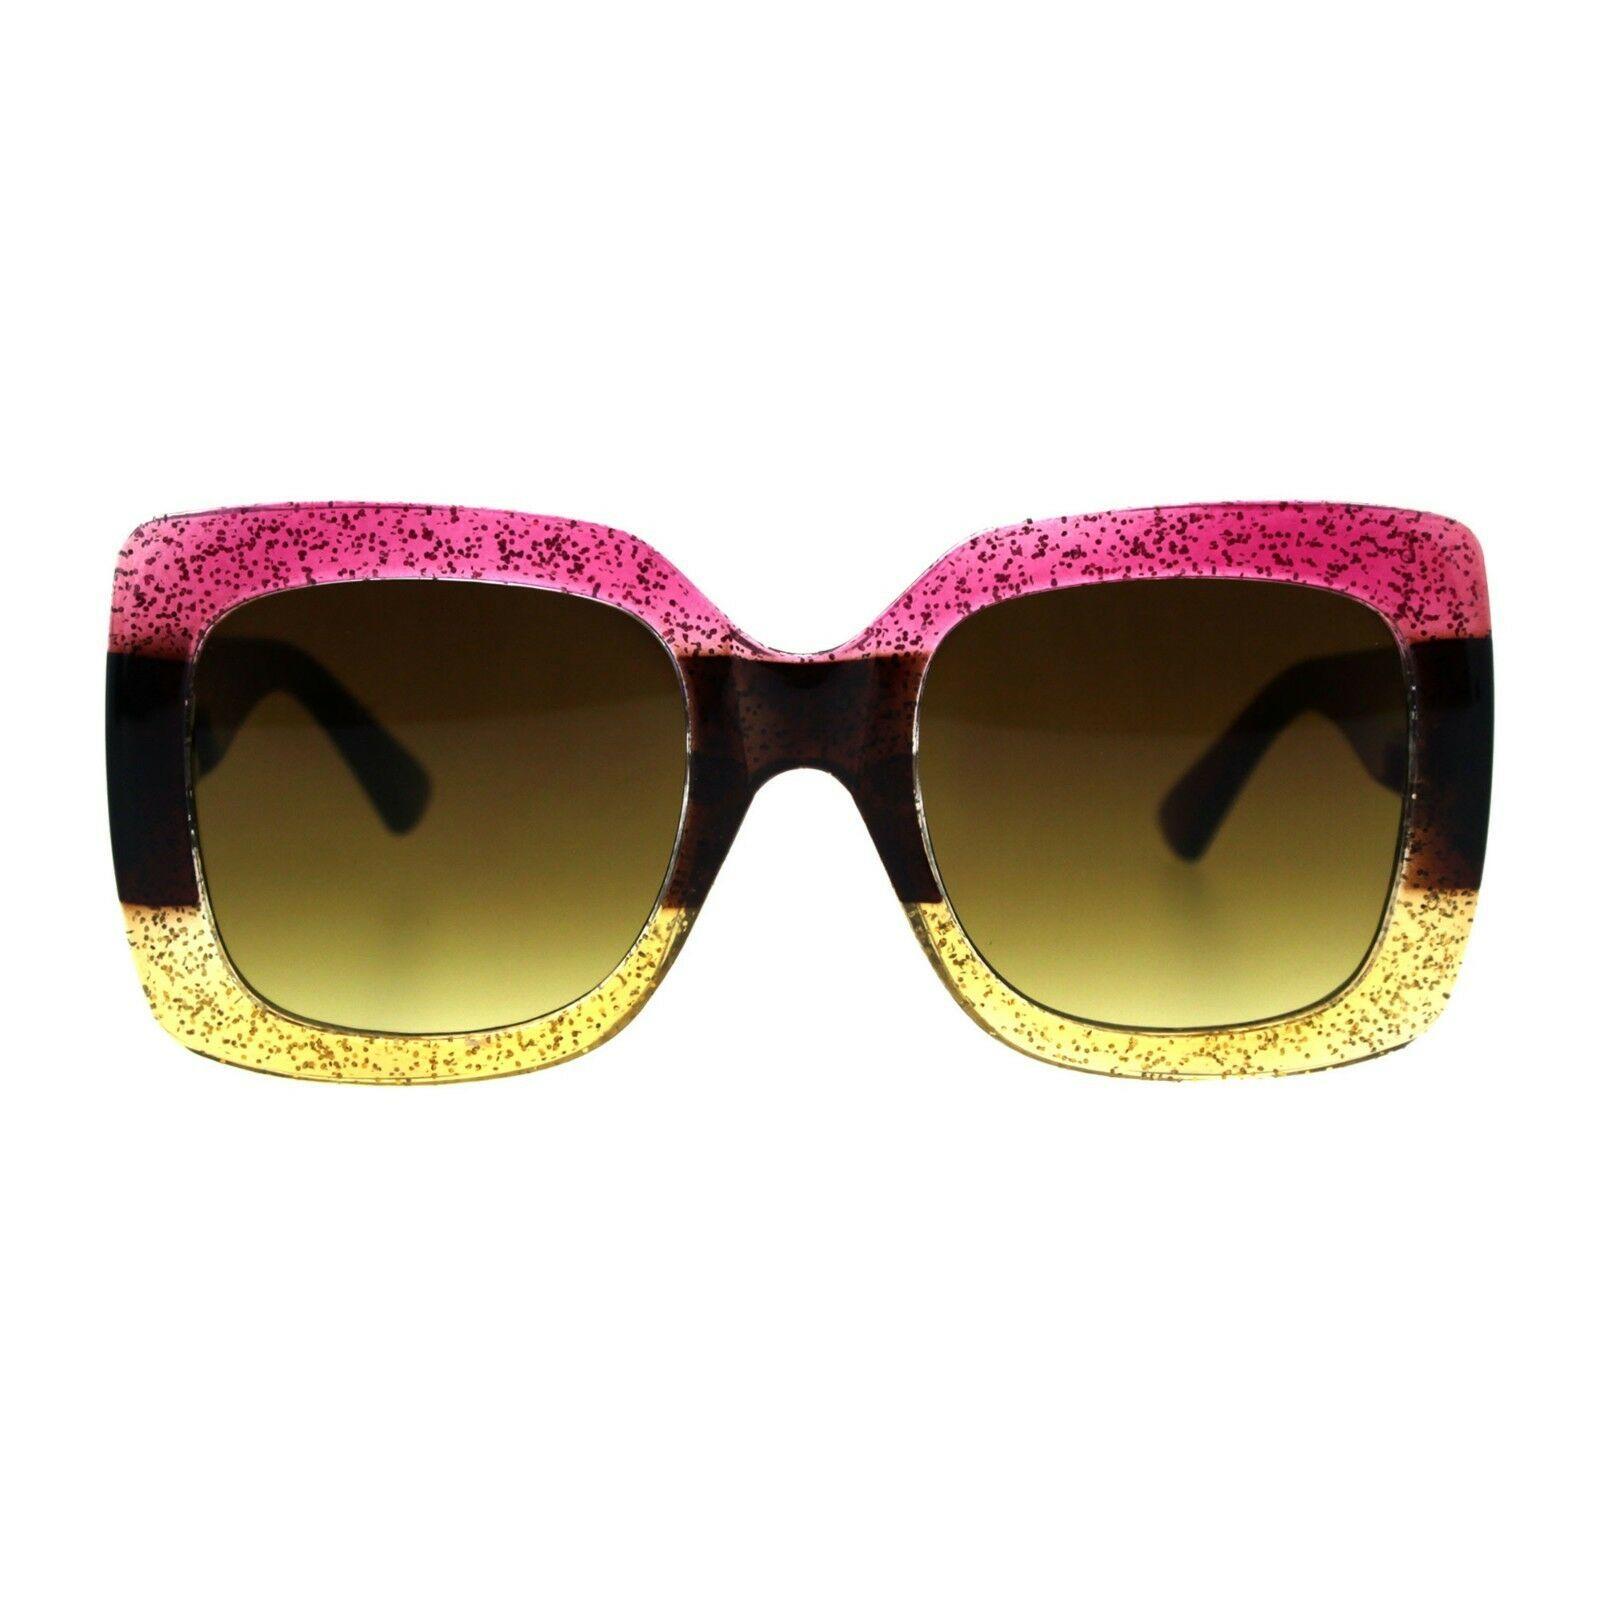 Thick Oversized Square Frame Sunglasses Womens Fashion Shades UV 400